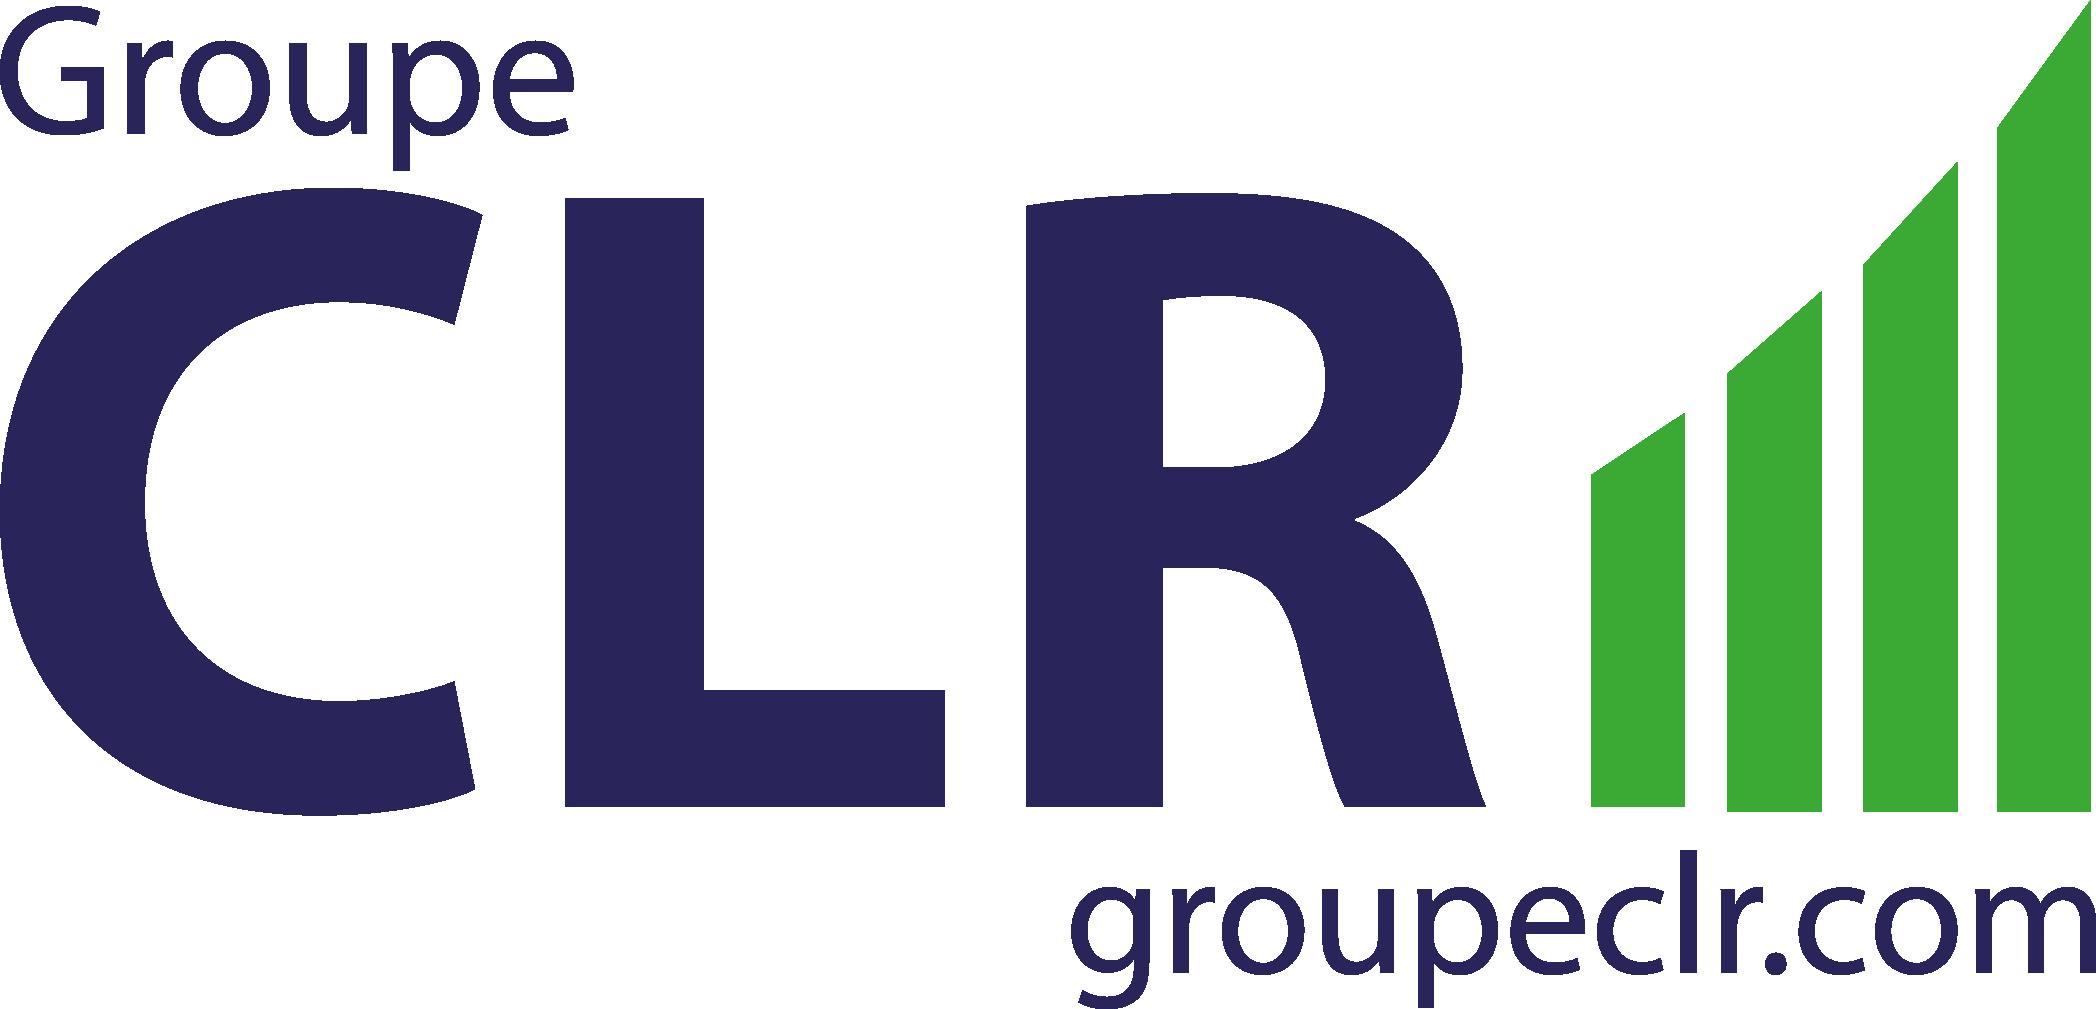 AA- Logo Groupe CLR 2019